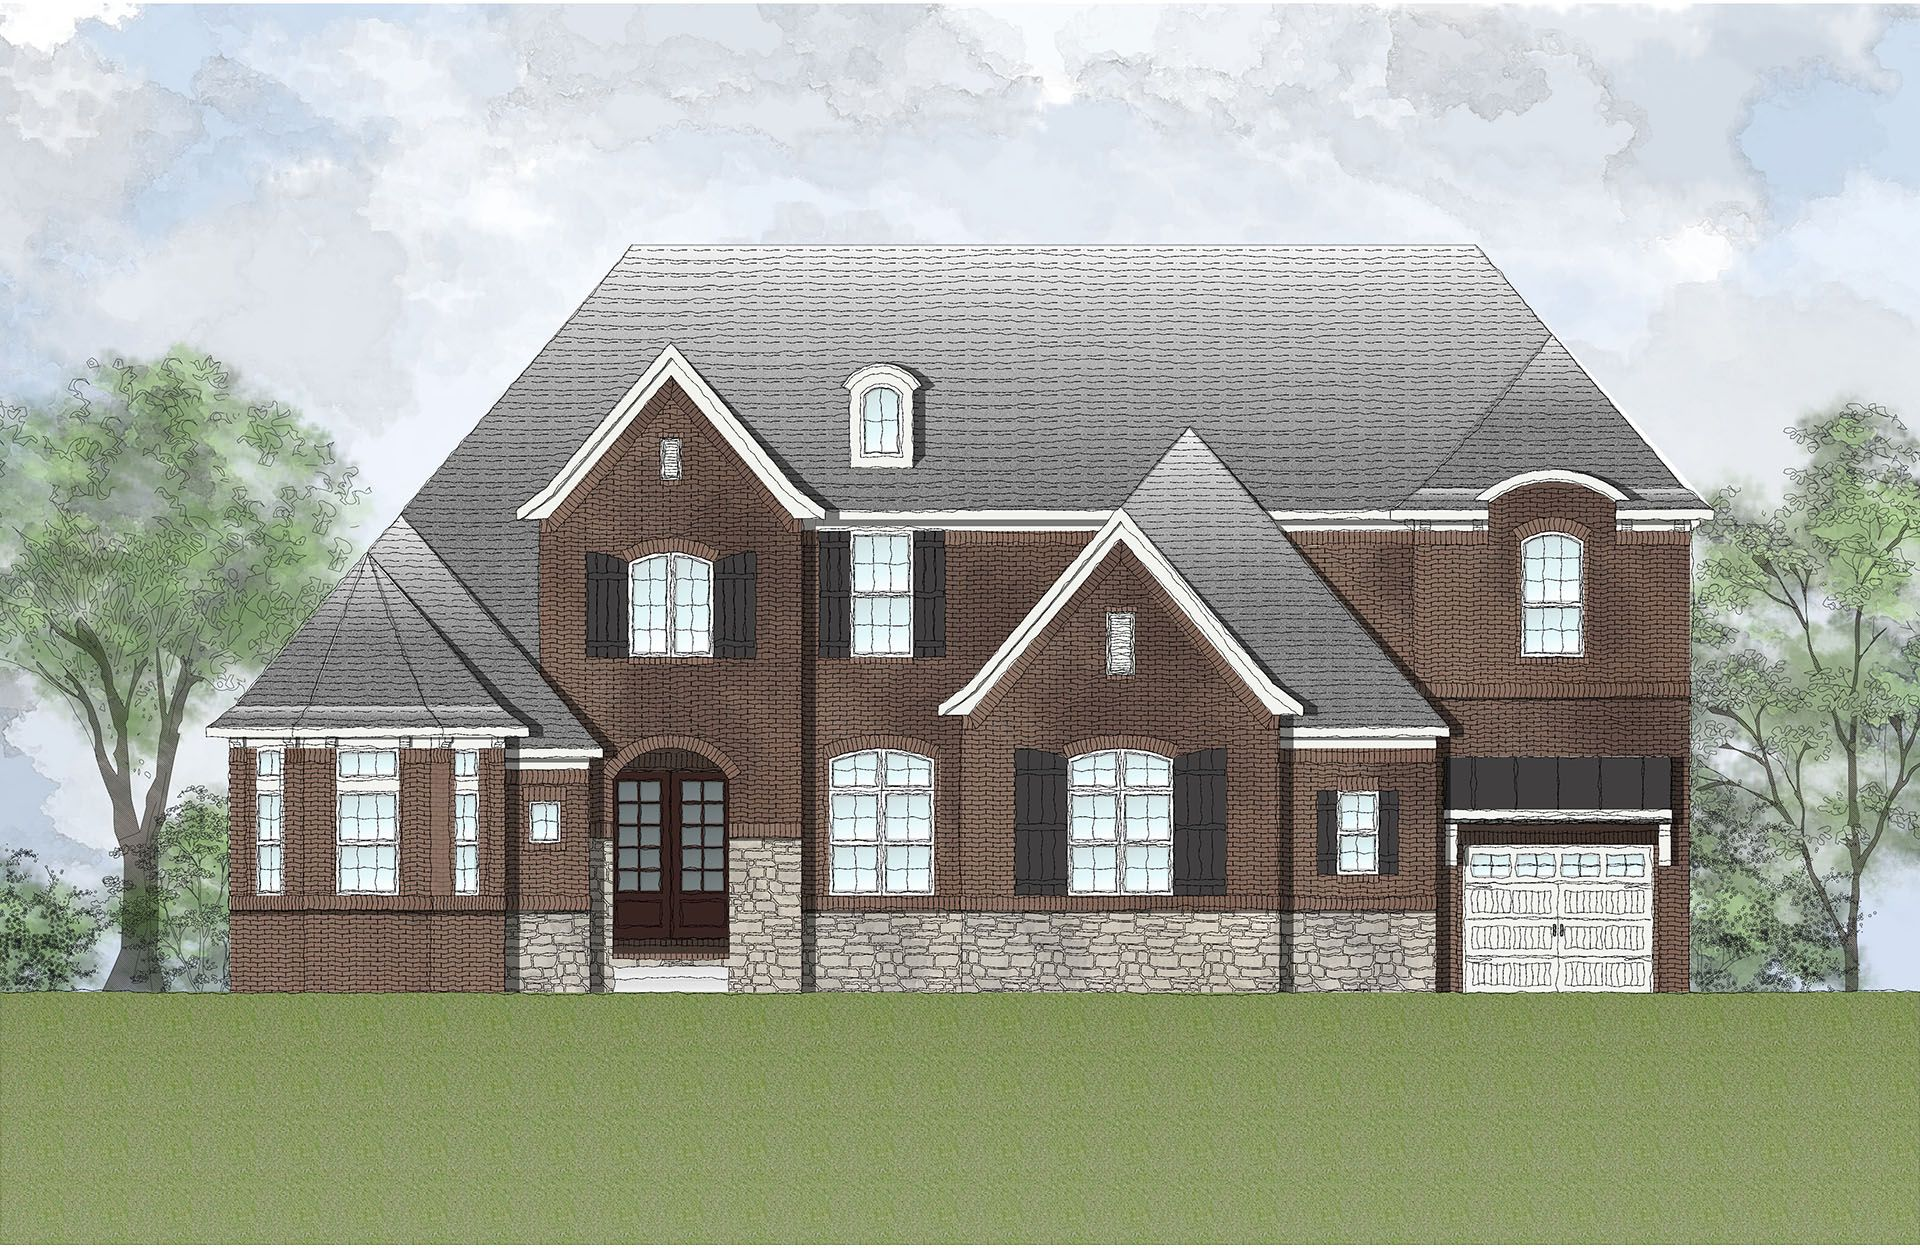 9485 Whetstone Blvd, Nashville - Green Hills, TN Homes & Land - Real Estate